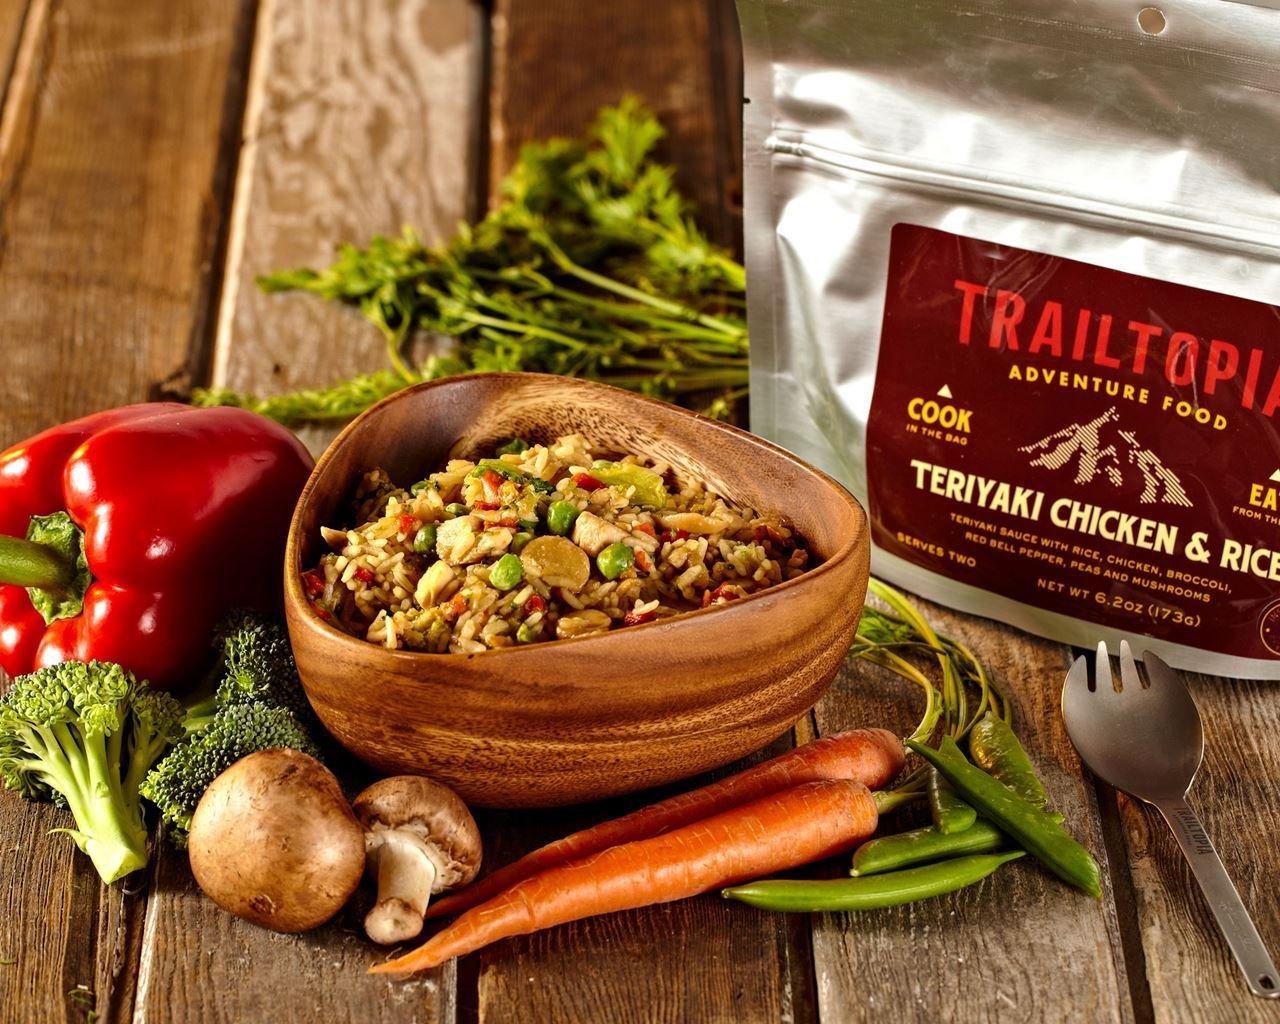 Trailtopia Teriyaki Chicken & Rice Dinner